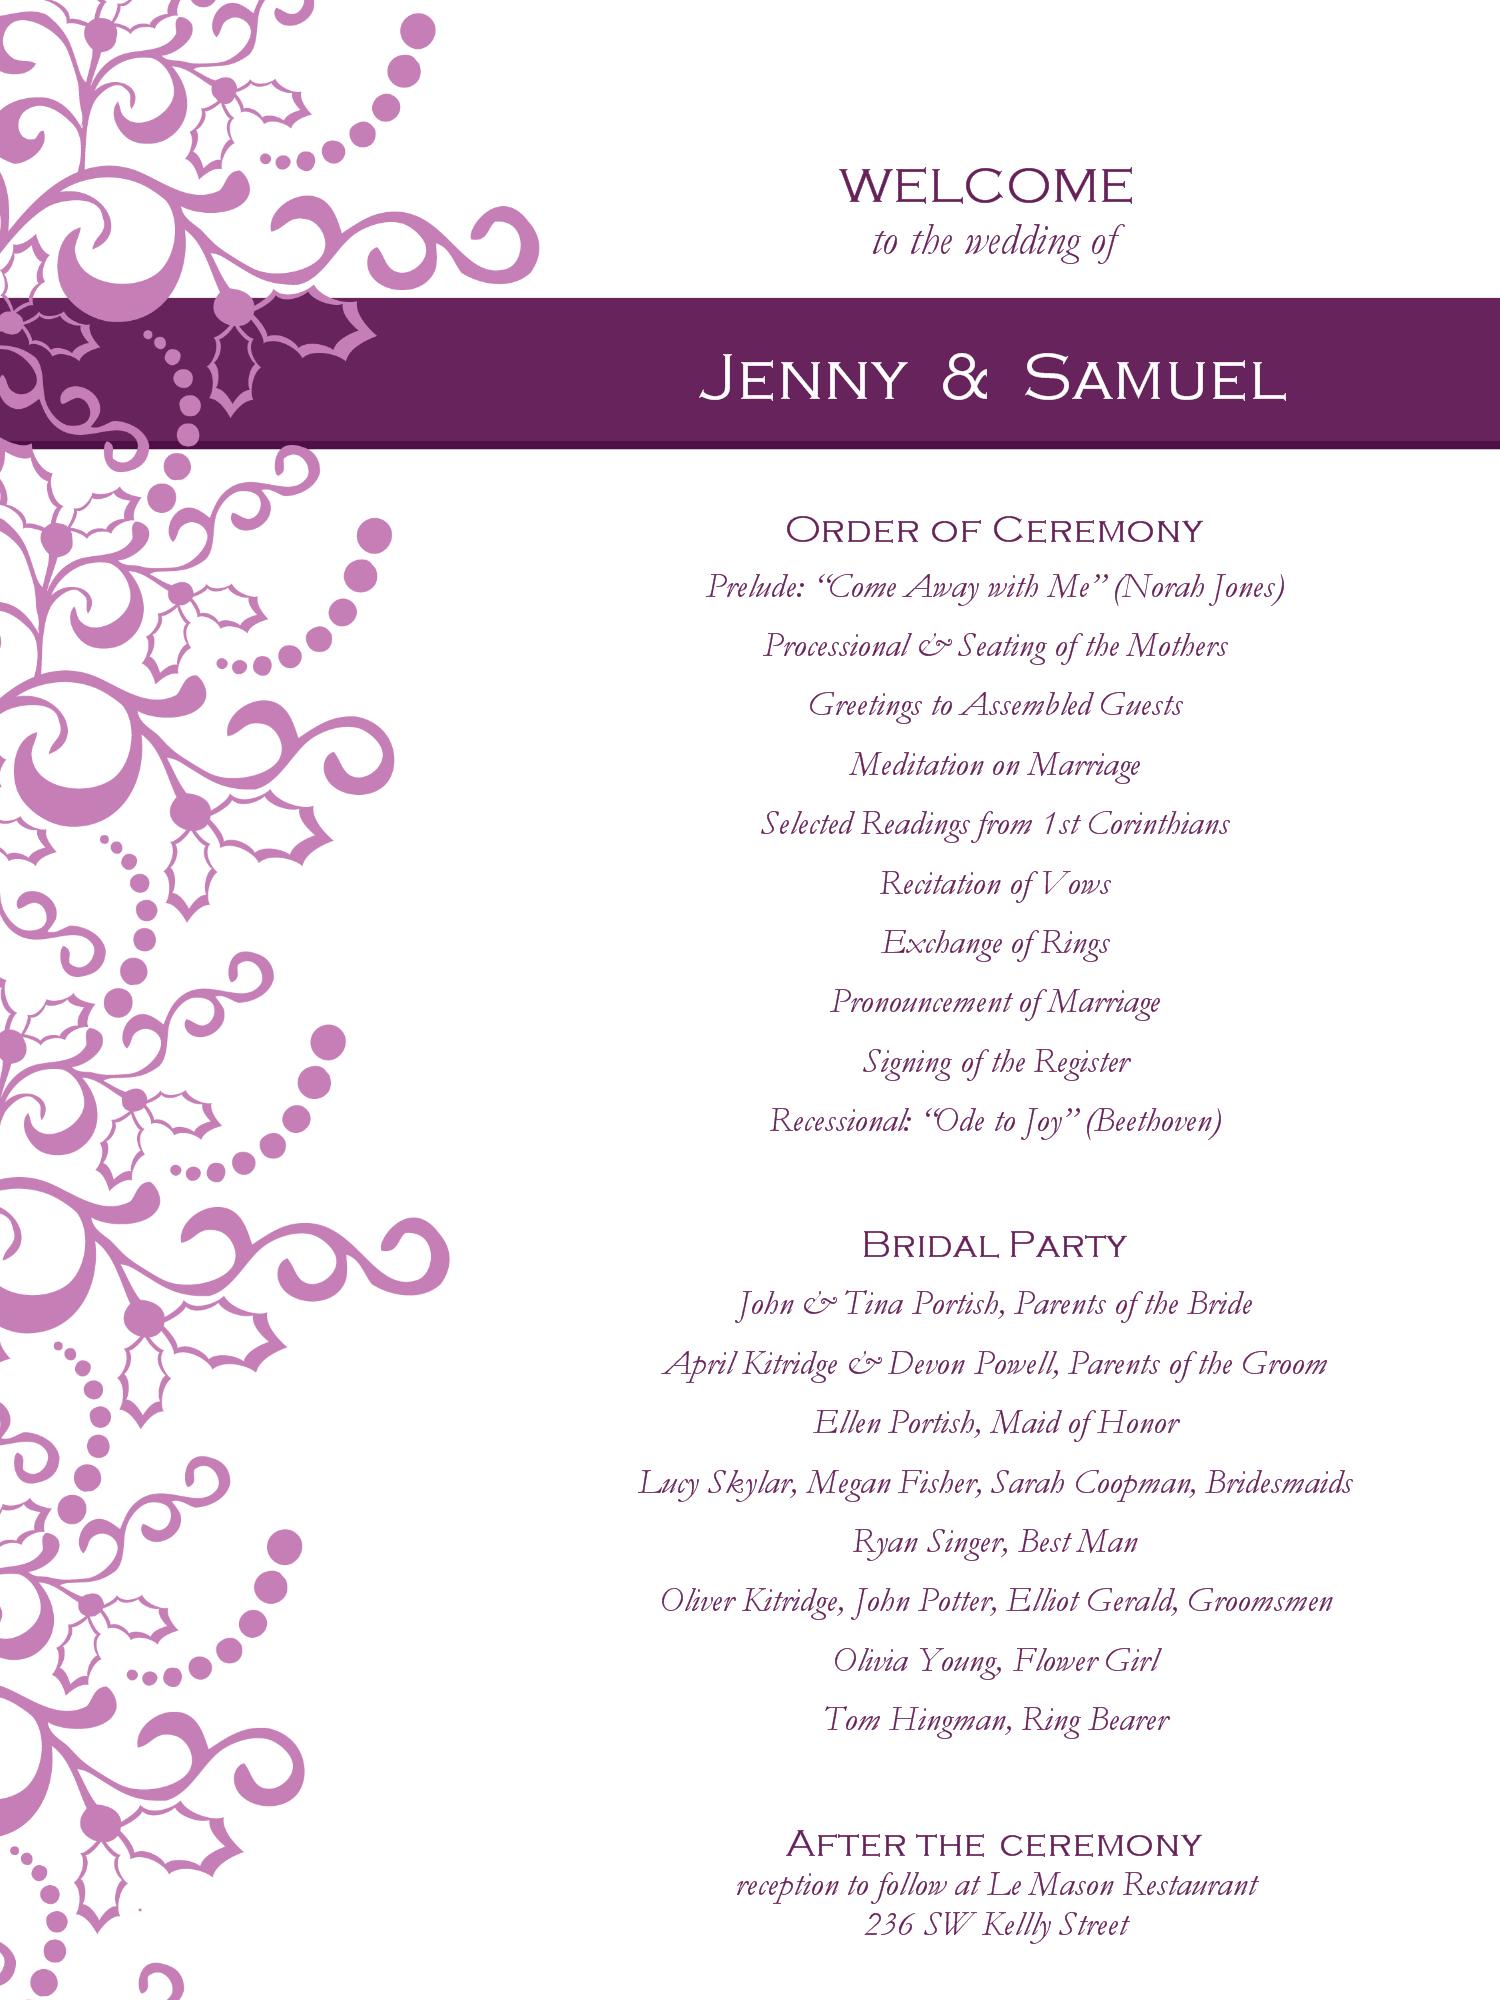 Wedding Program Templates Free | Weddingclipart | Wedding - Free Printable Wedding Program Samples